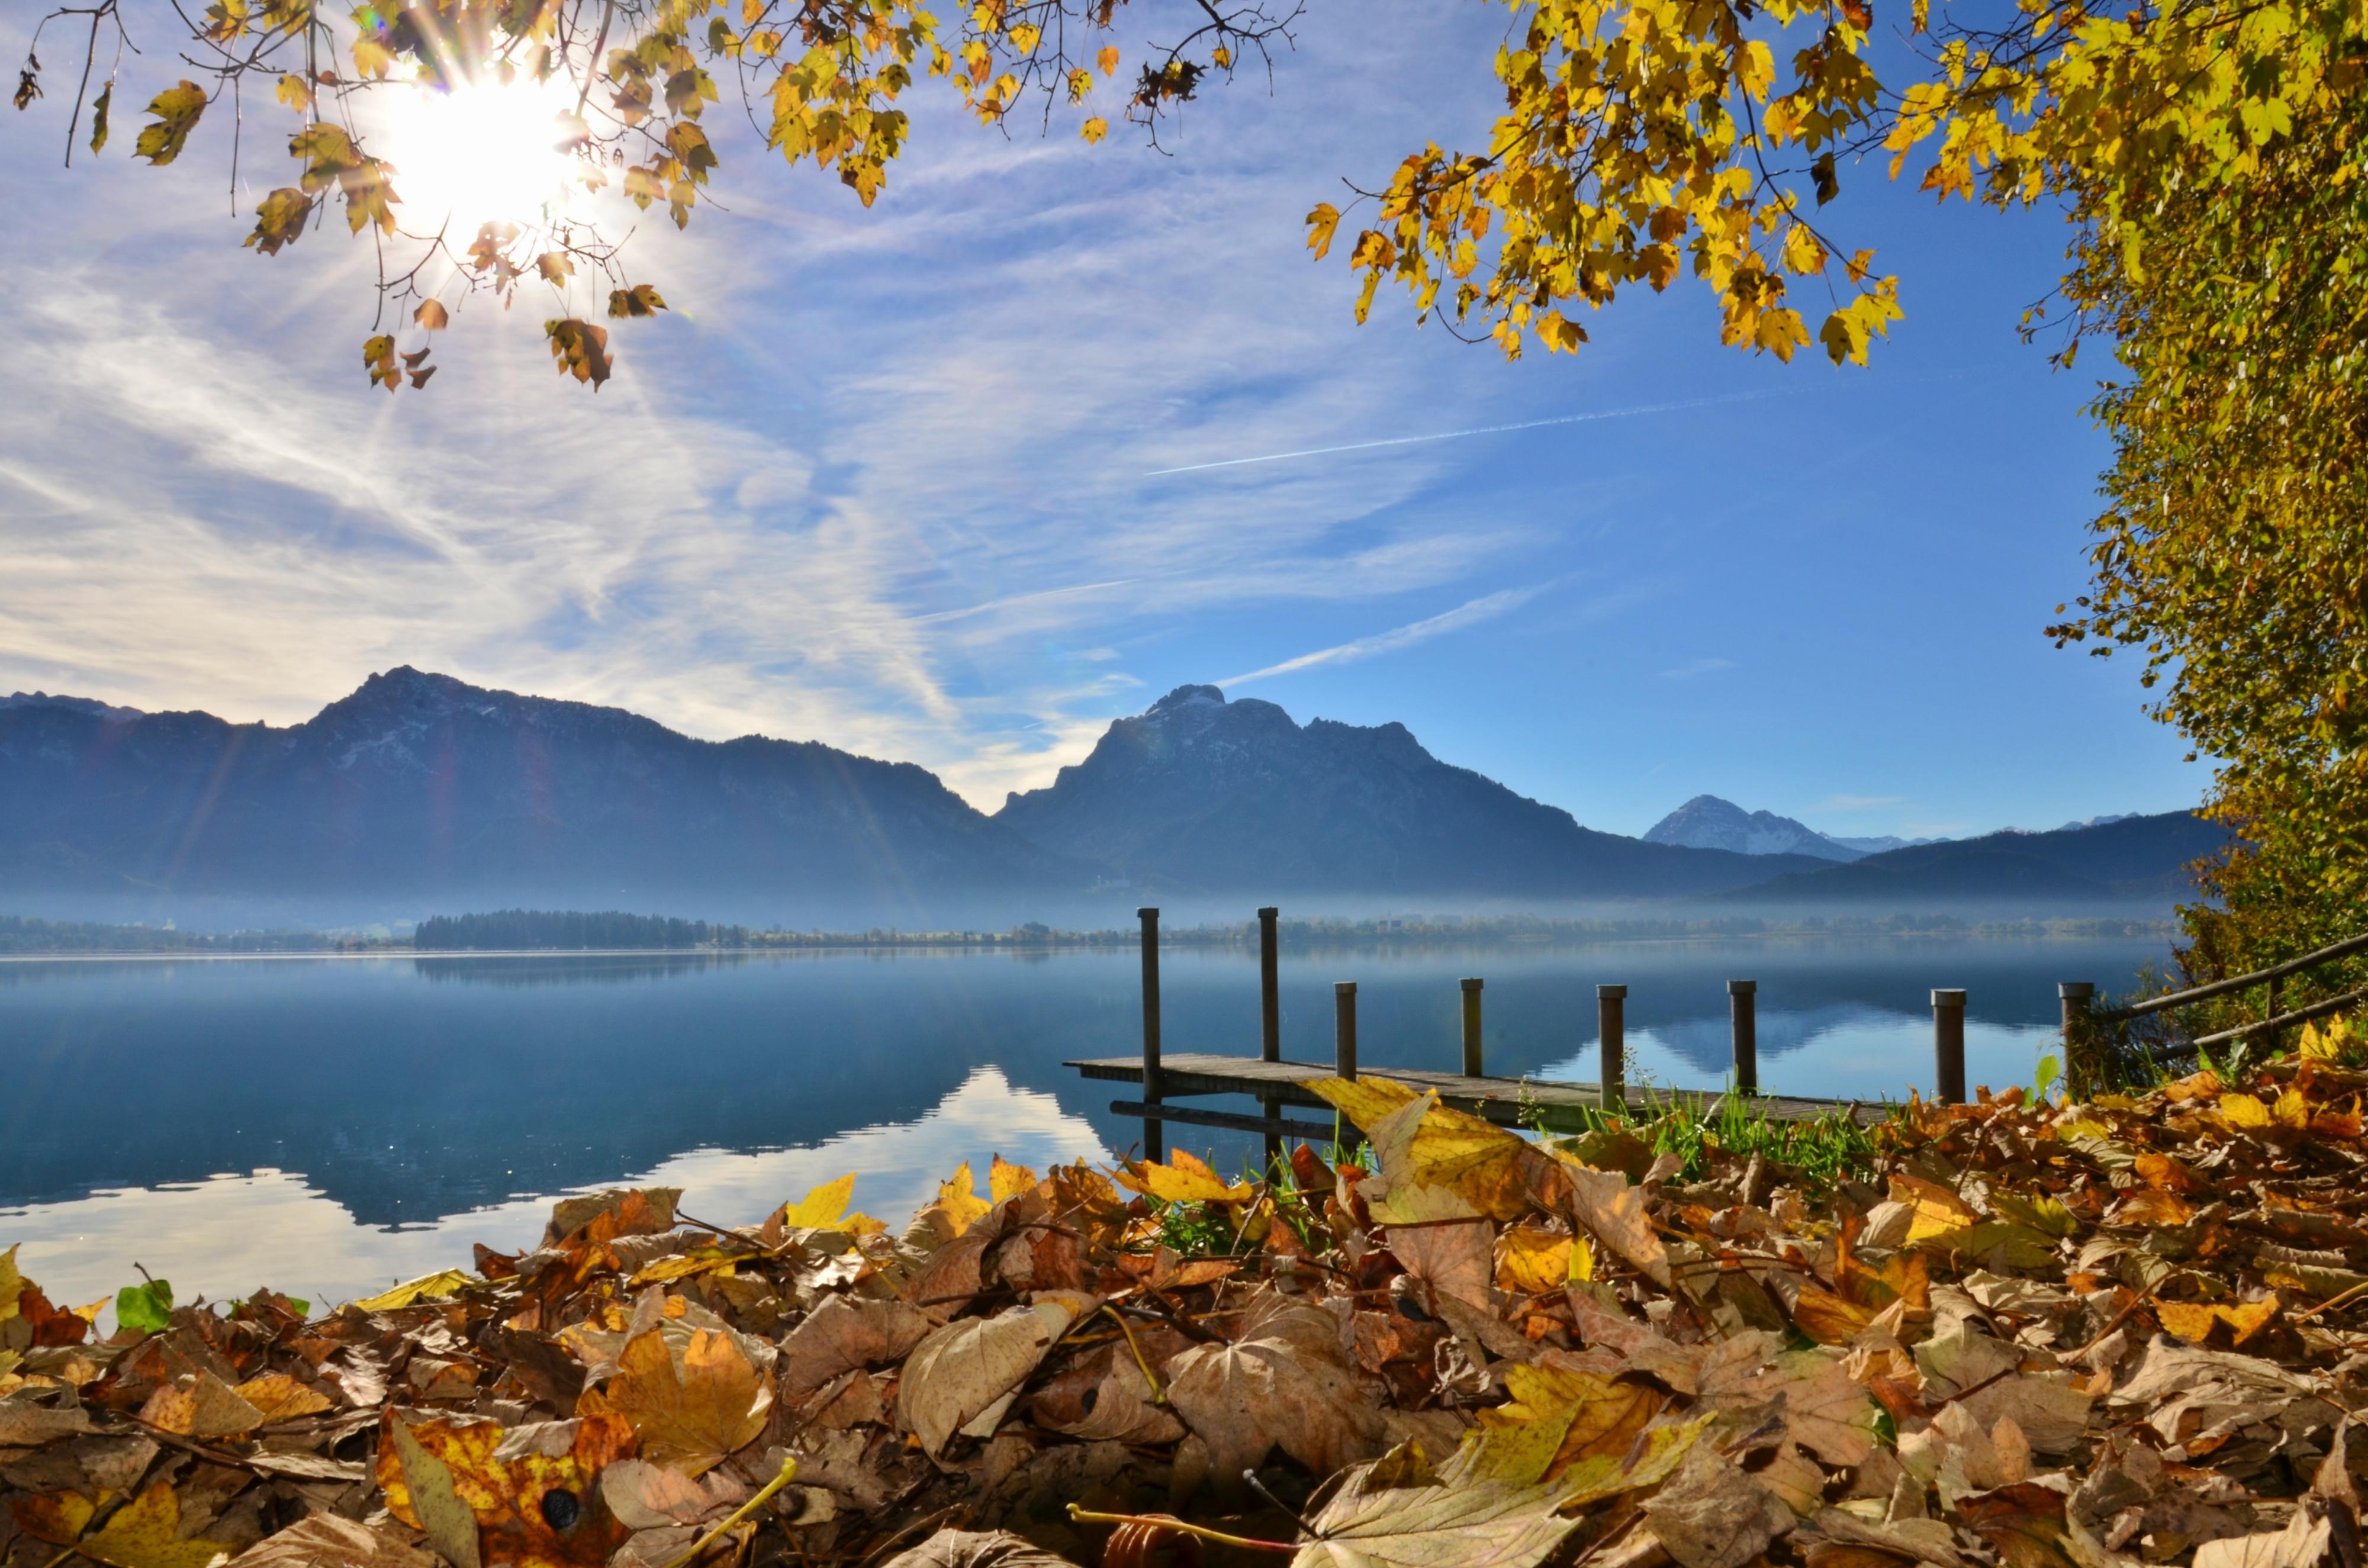 G0211 Herbstsonne am Forggensee.jpg